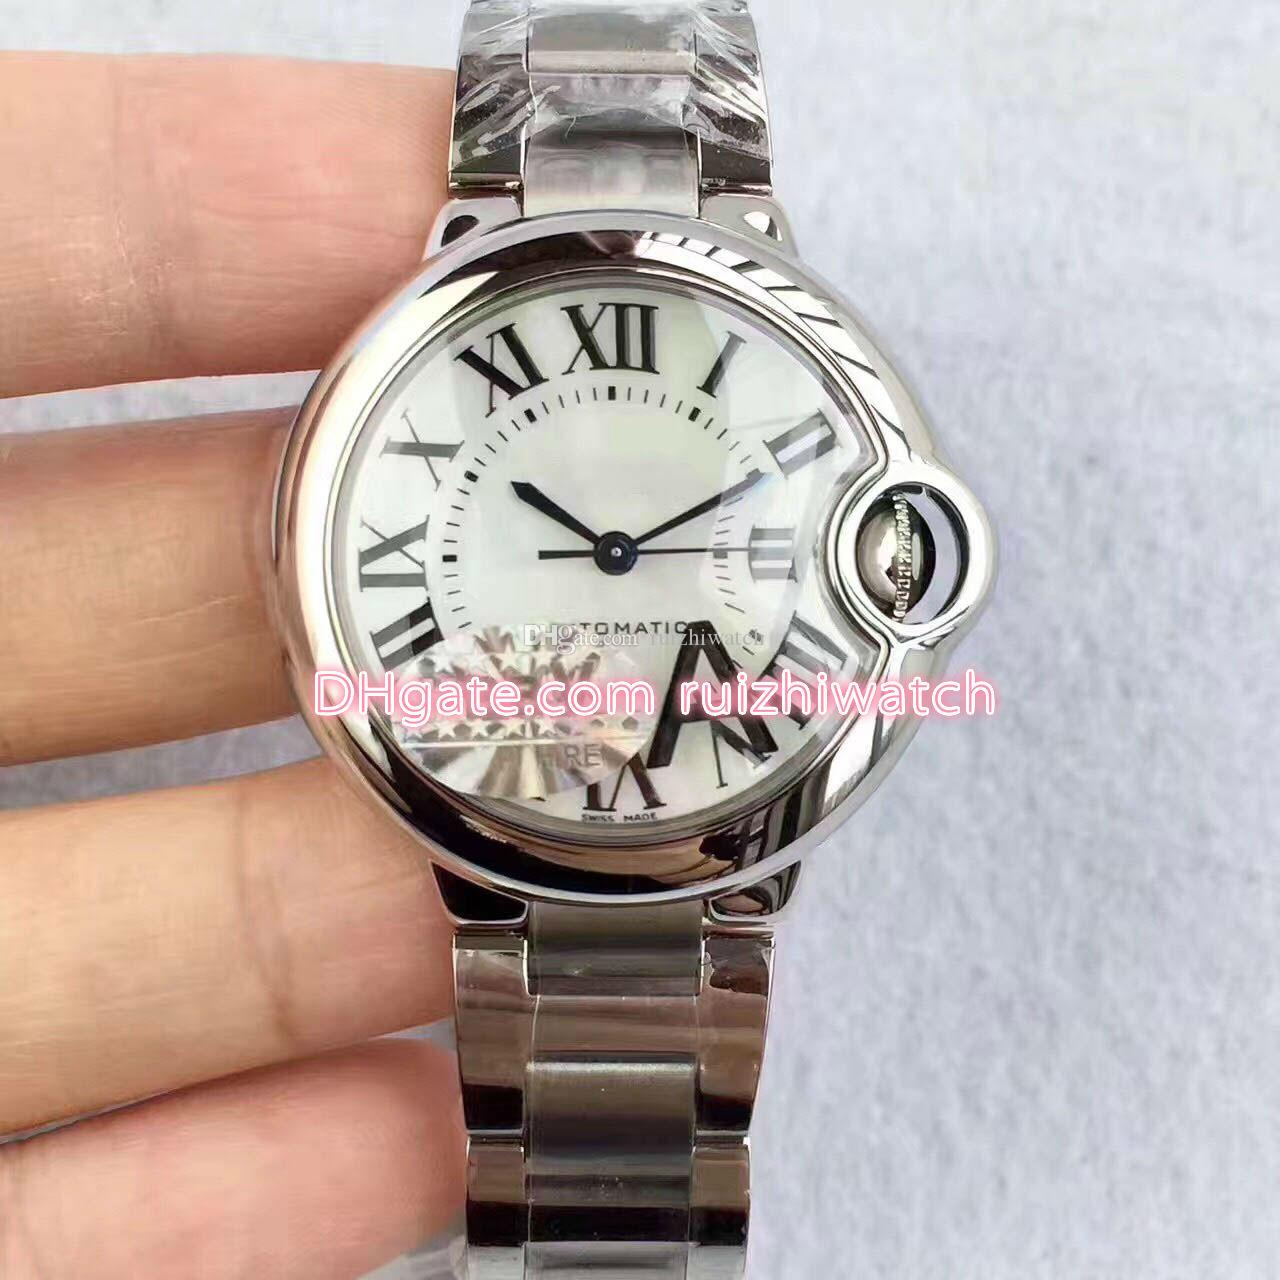 Mejor reloj automatico mujer